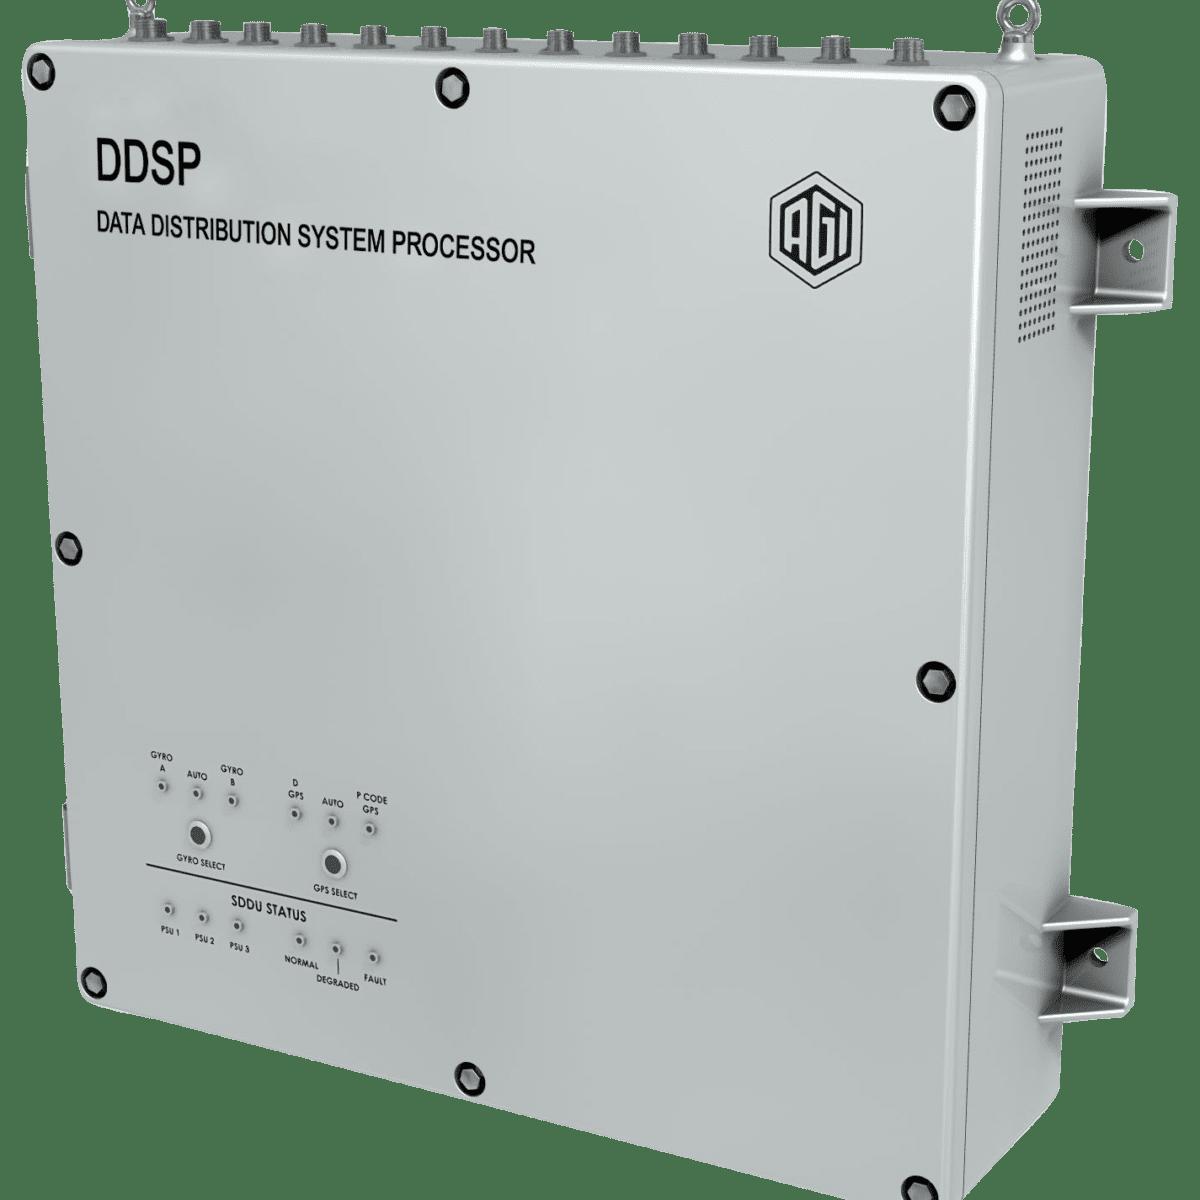 DDSP unit from AGI